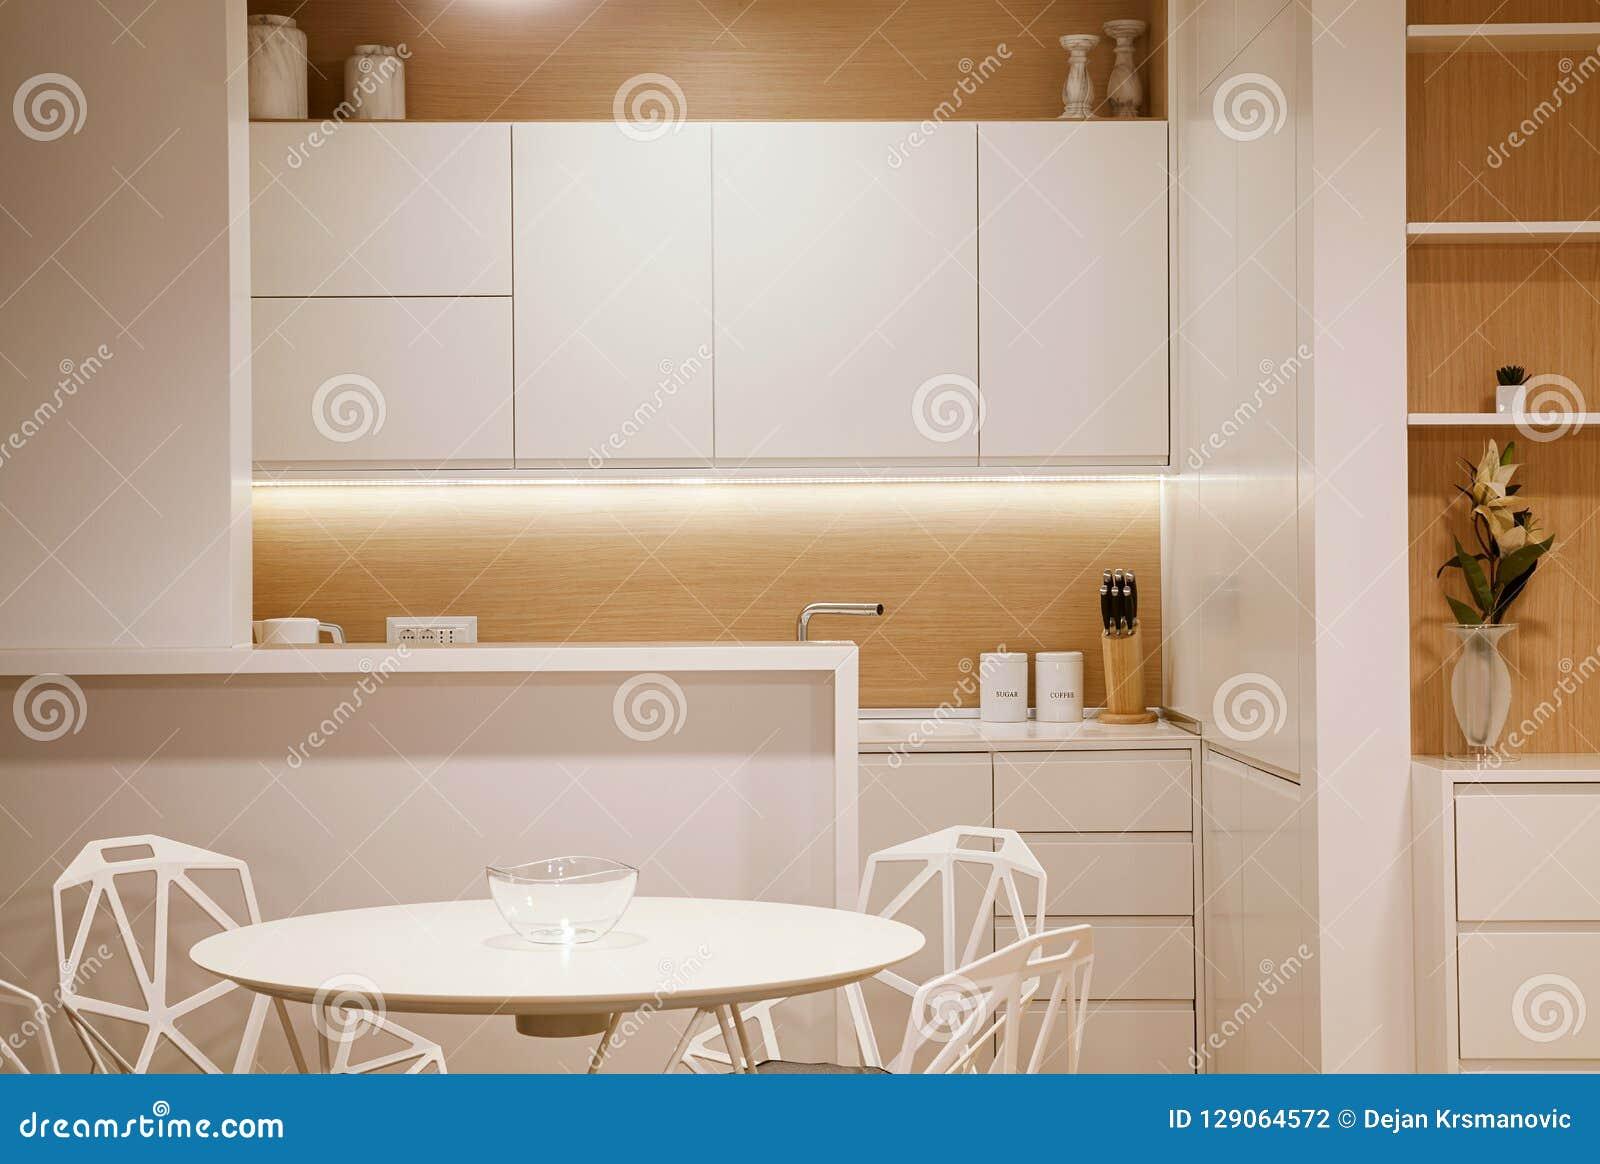 Petite cuisine moderne photo stock. Image du architectural ...